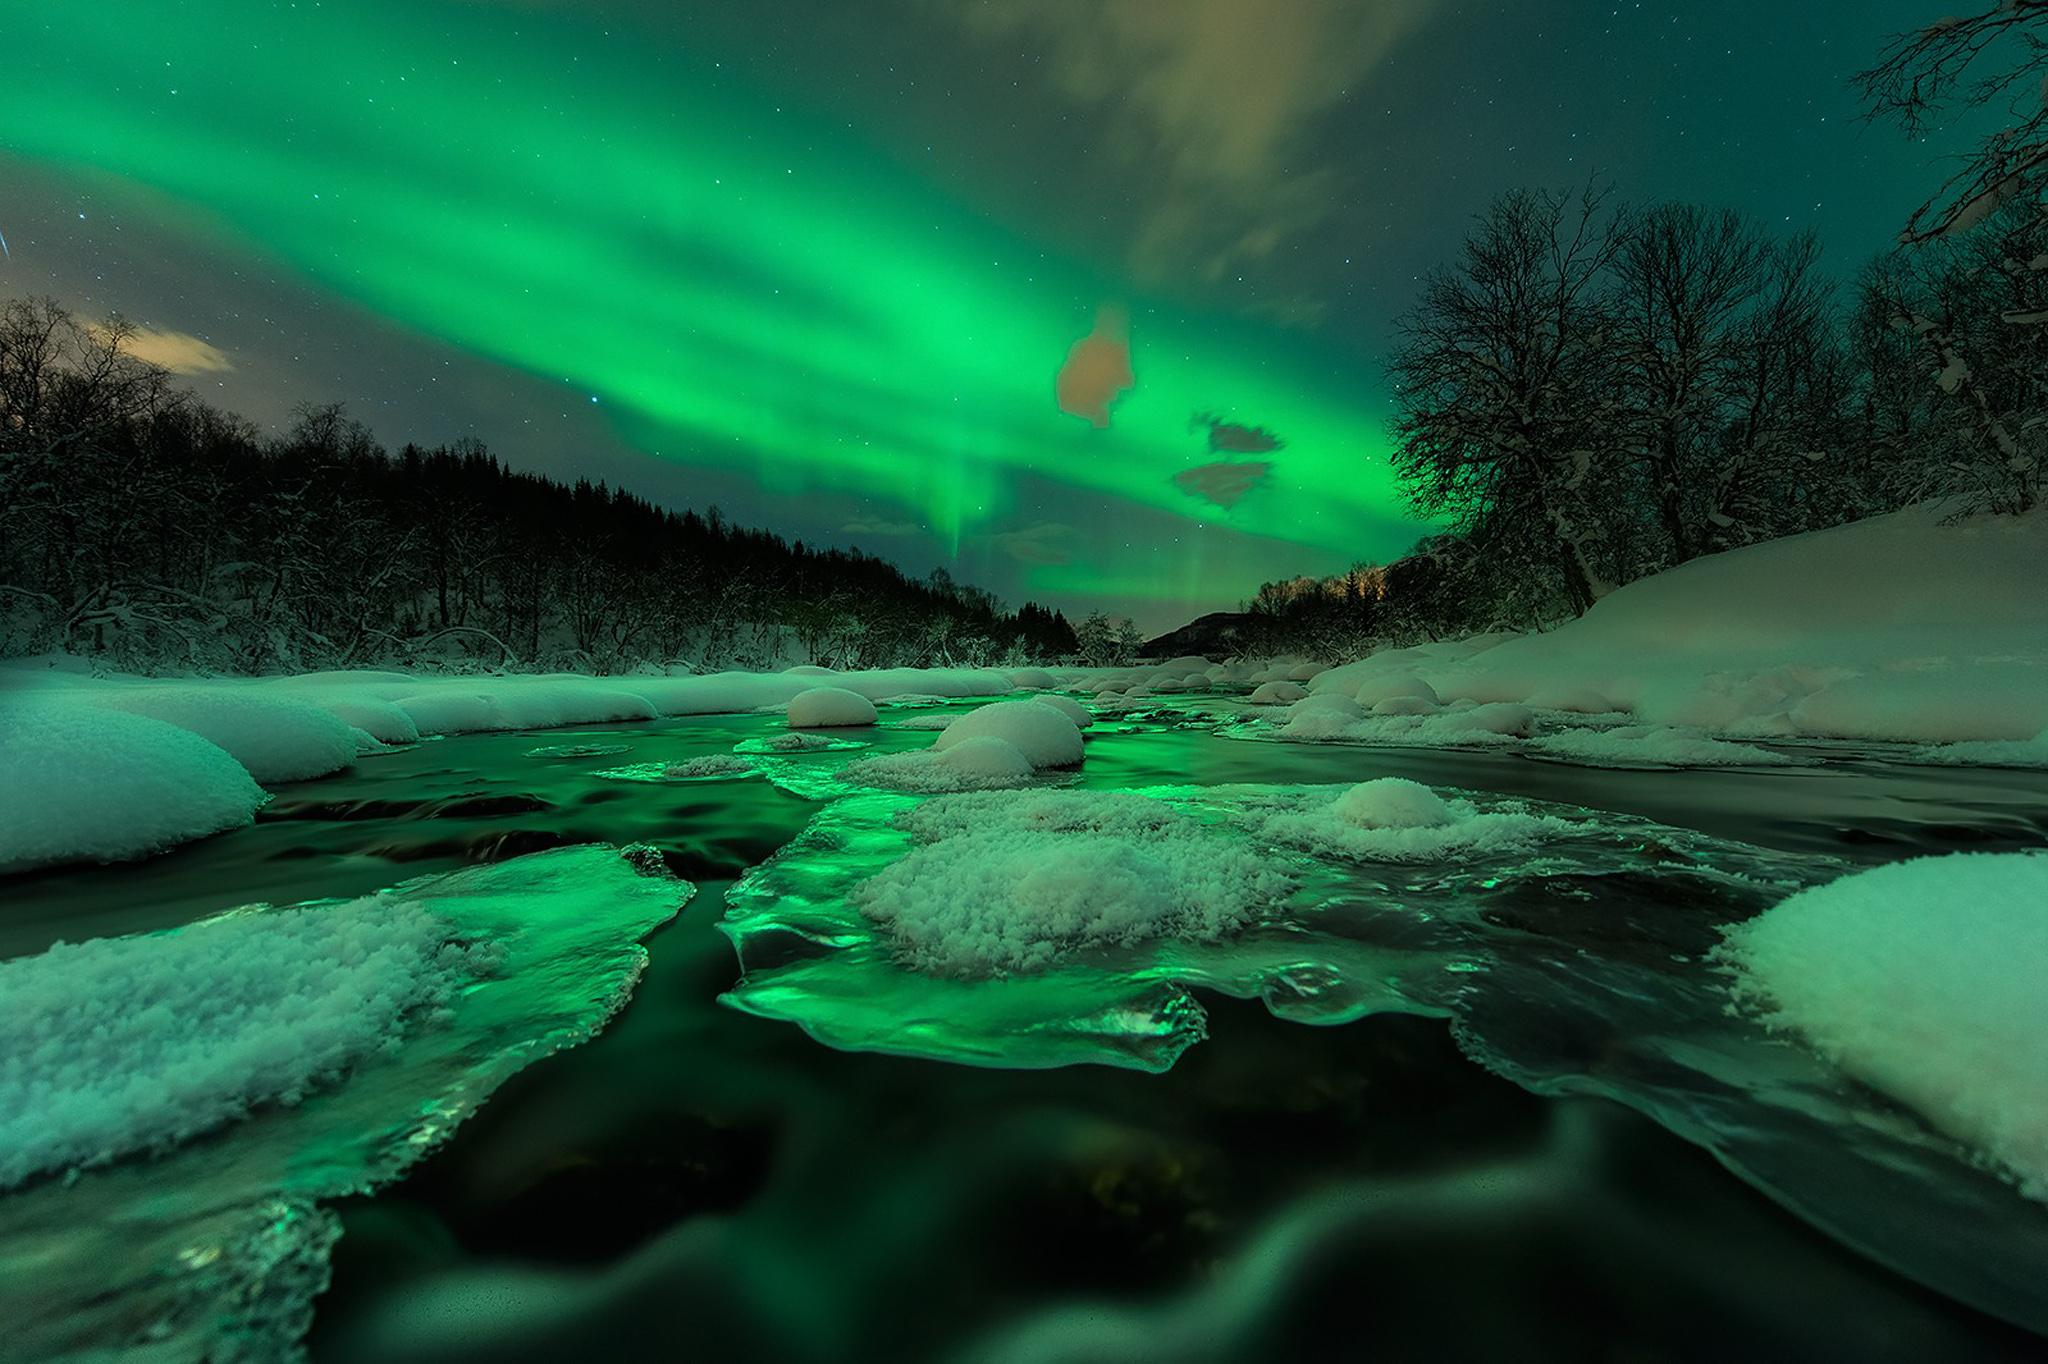 4k aurora wallpaper wallpapersafari for Sfondi desktop aurora boreale